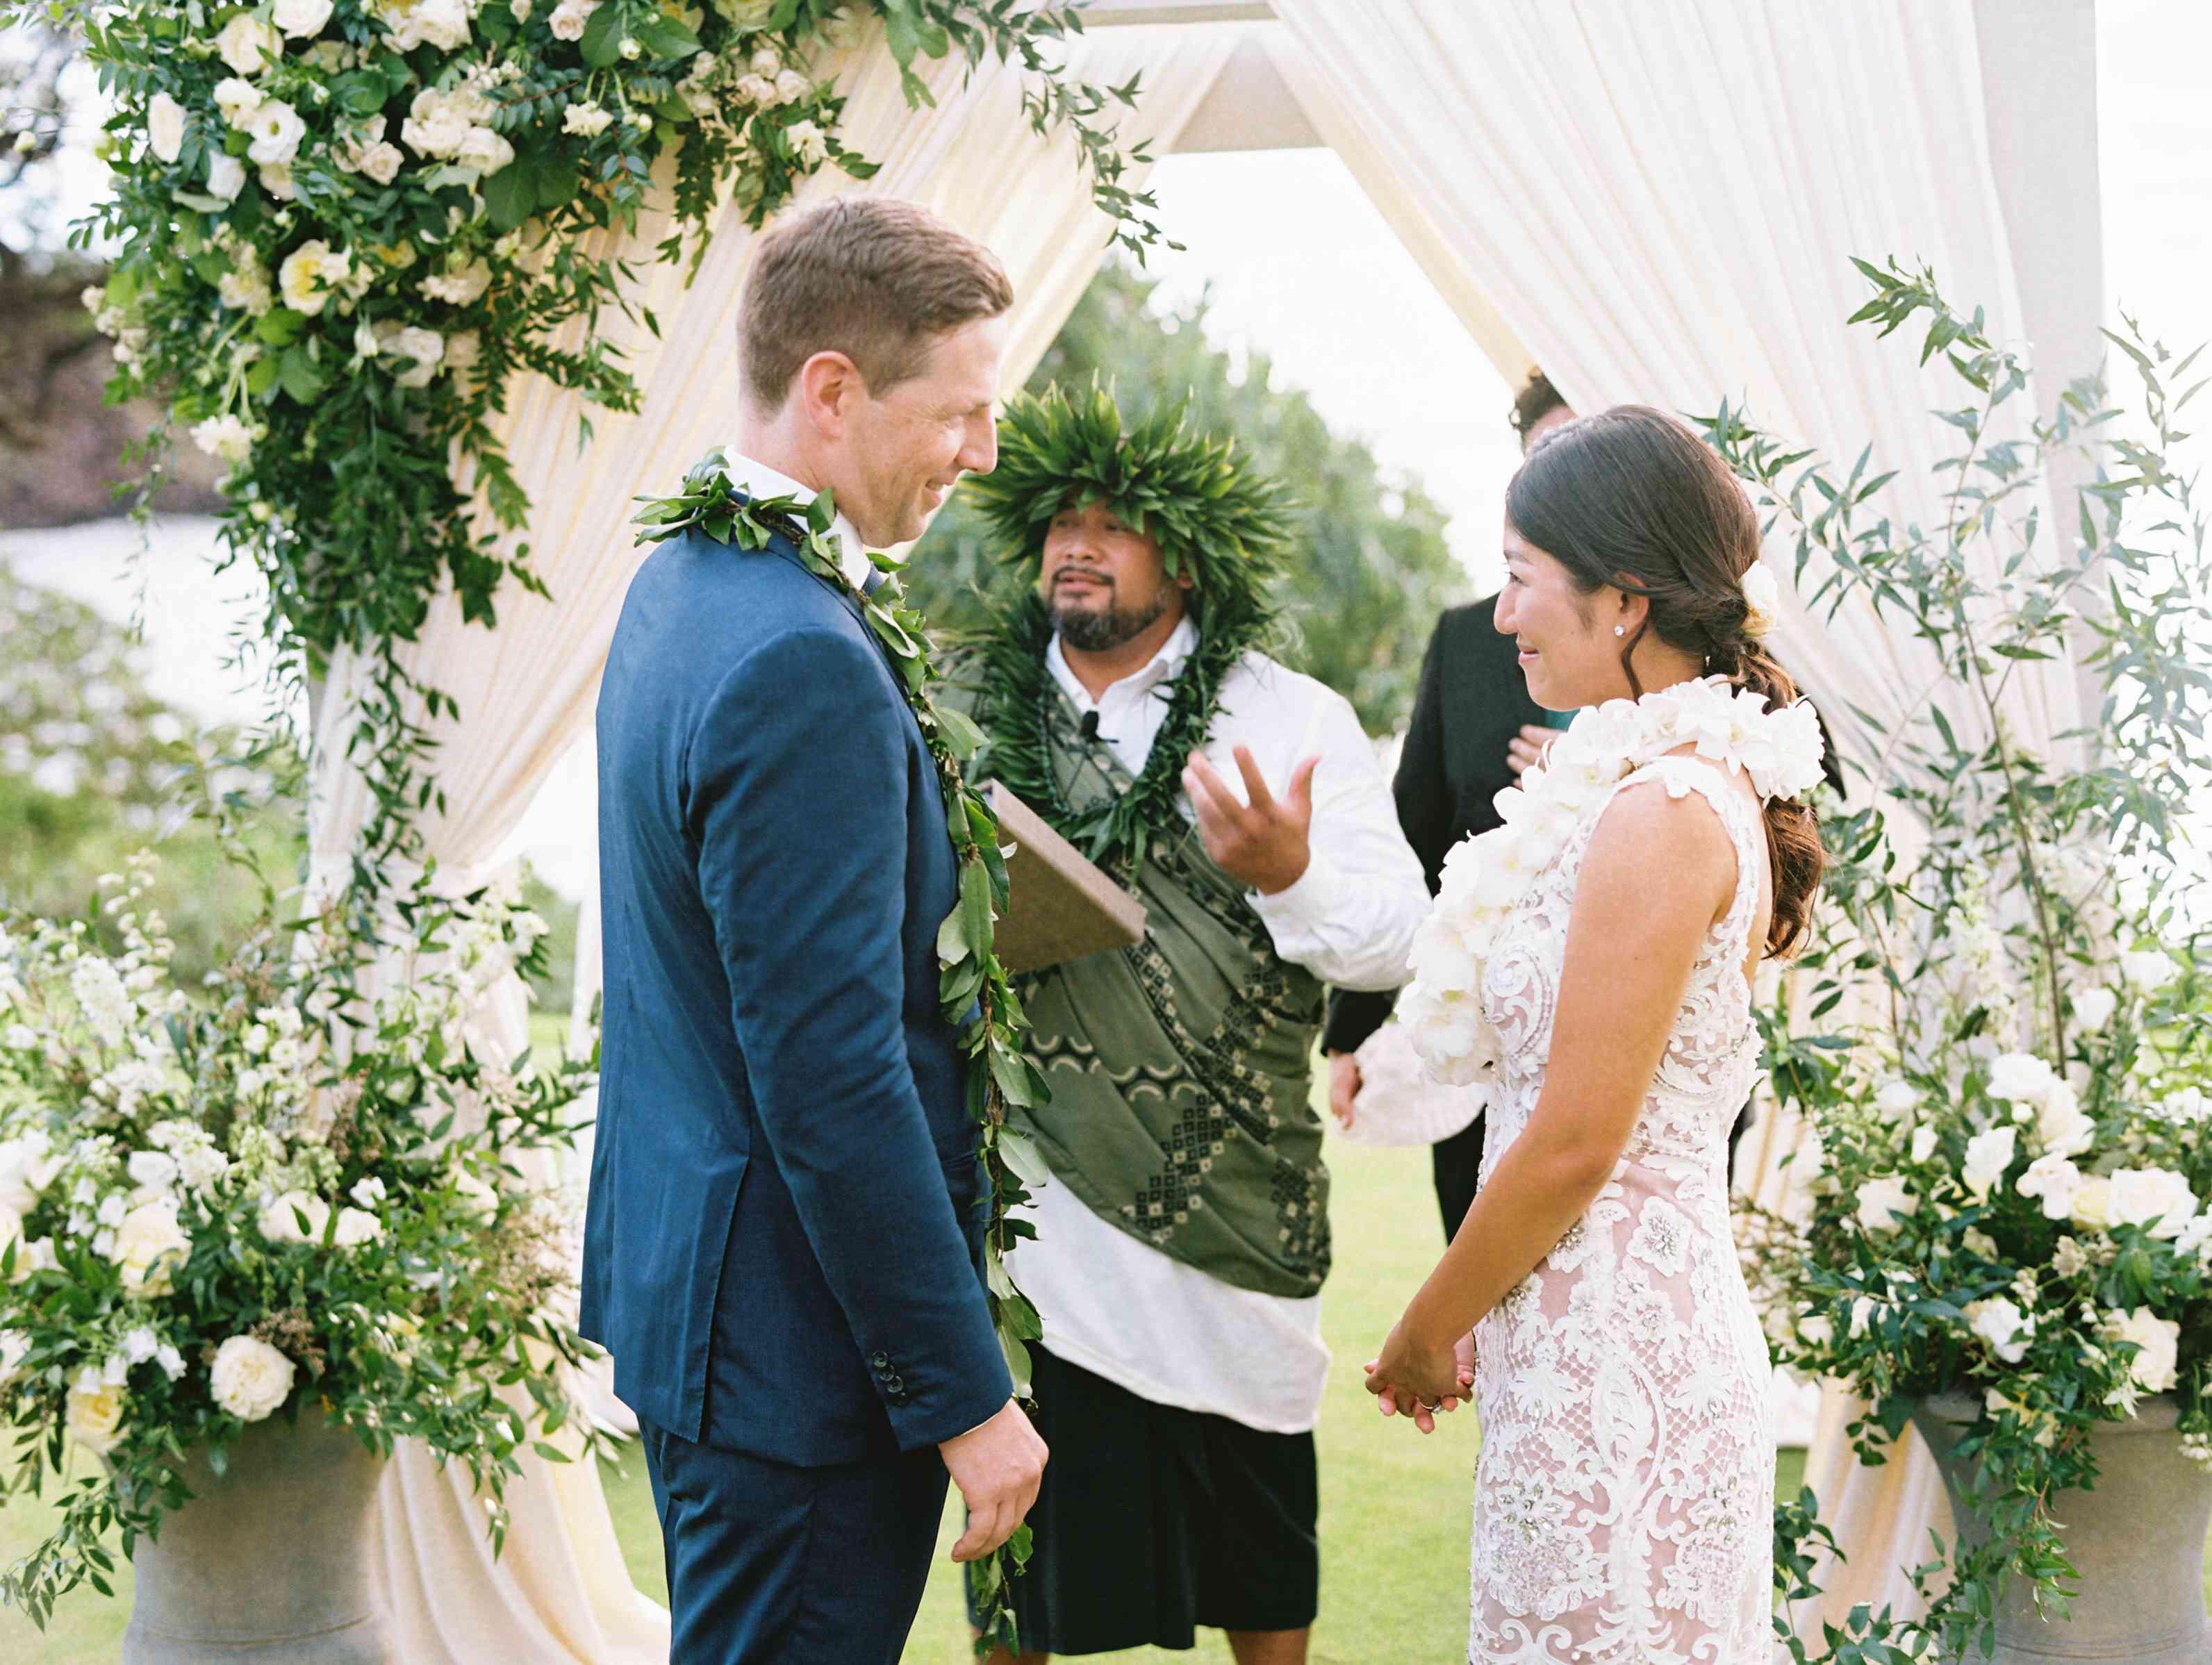 <p>couple at altar wedding ceremony</p>